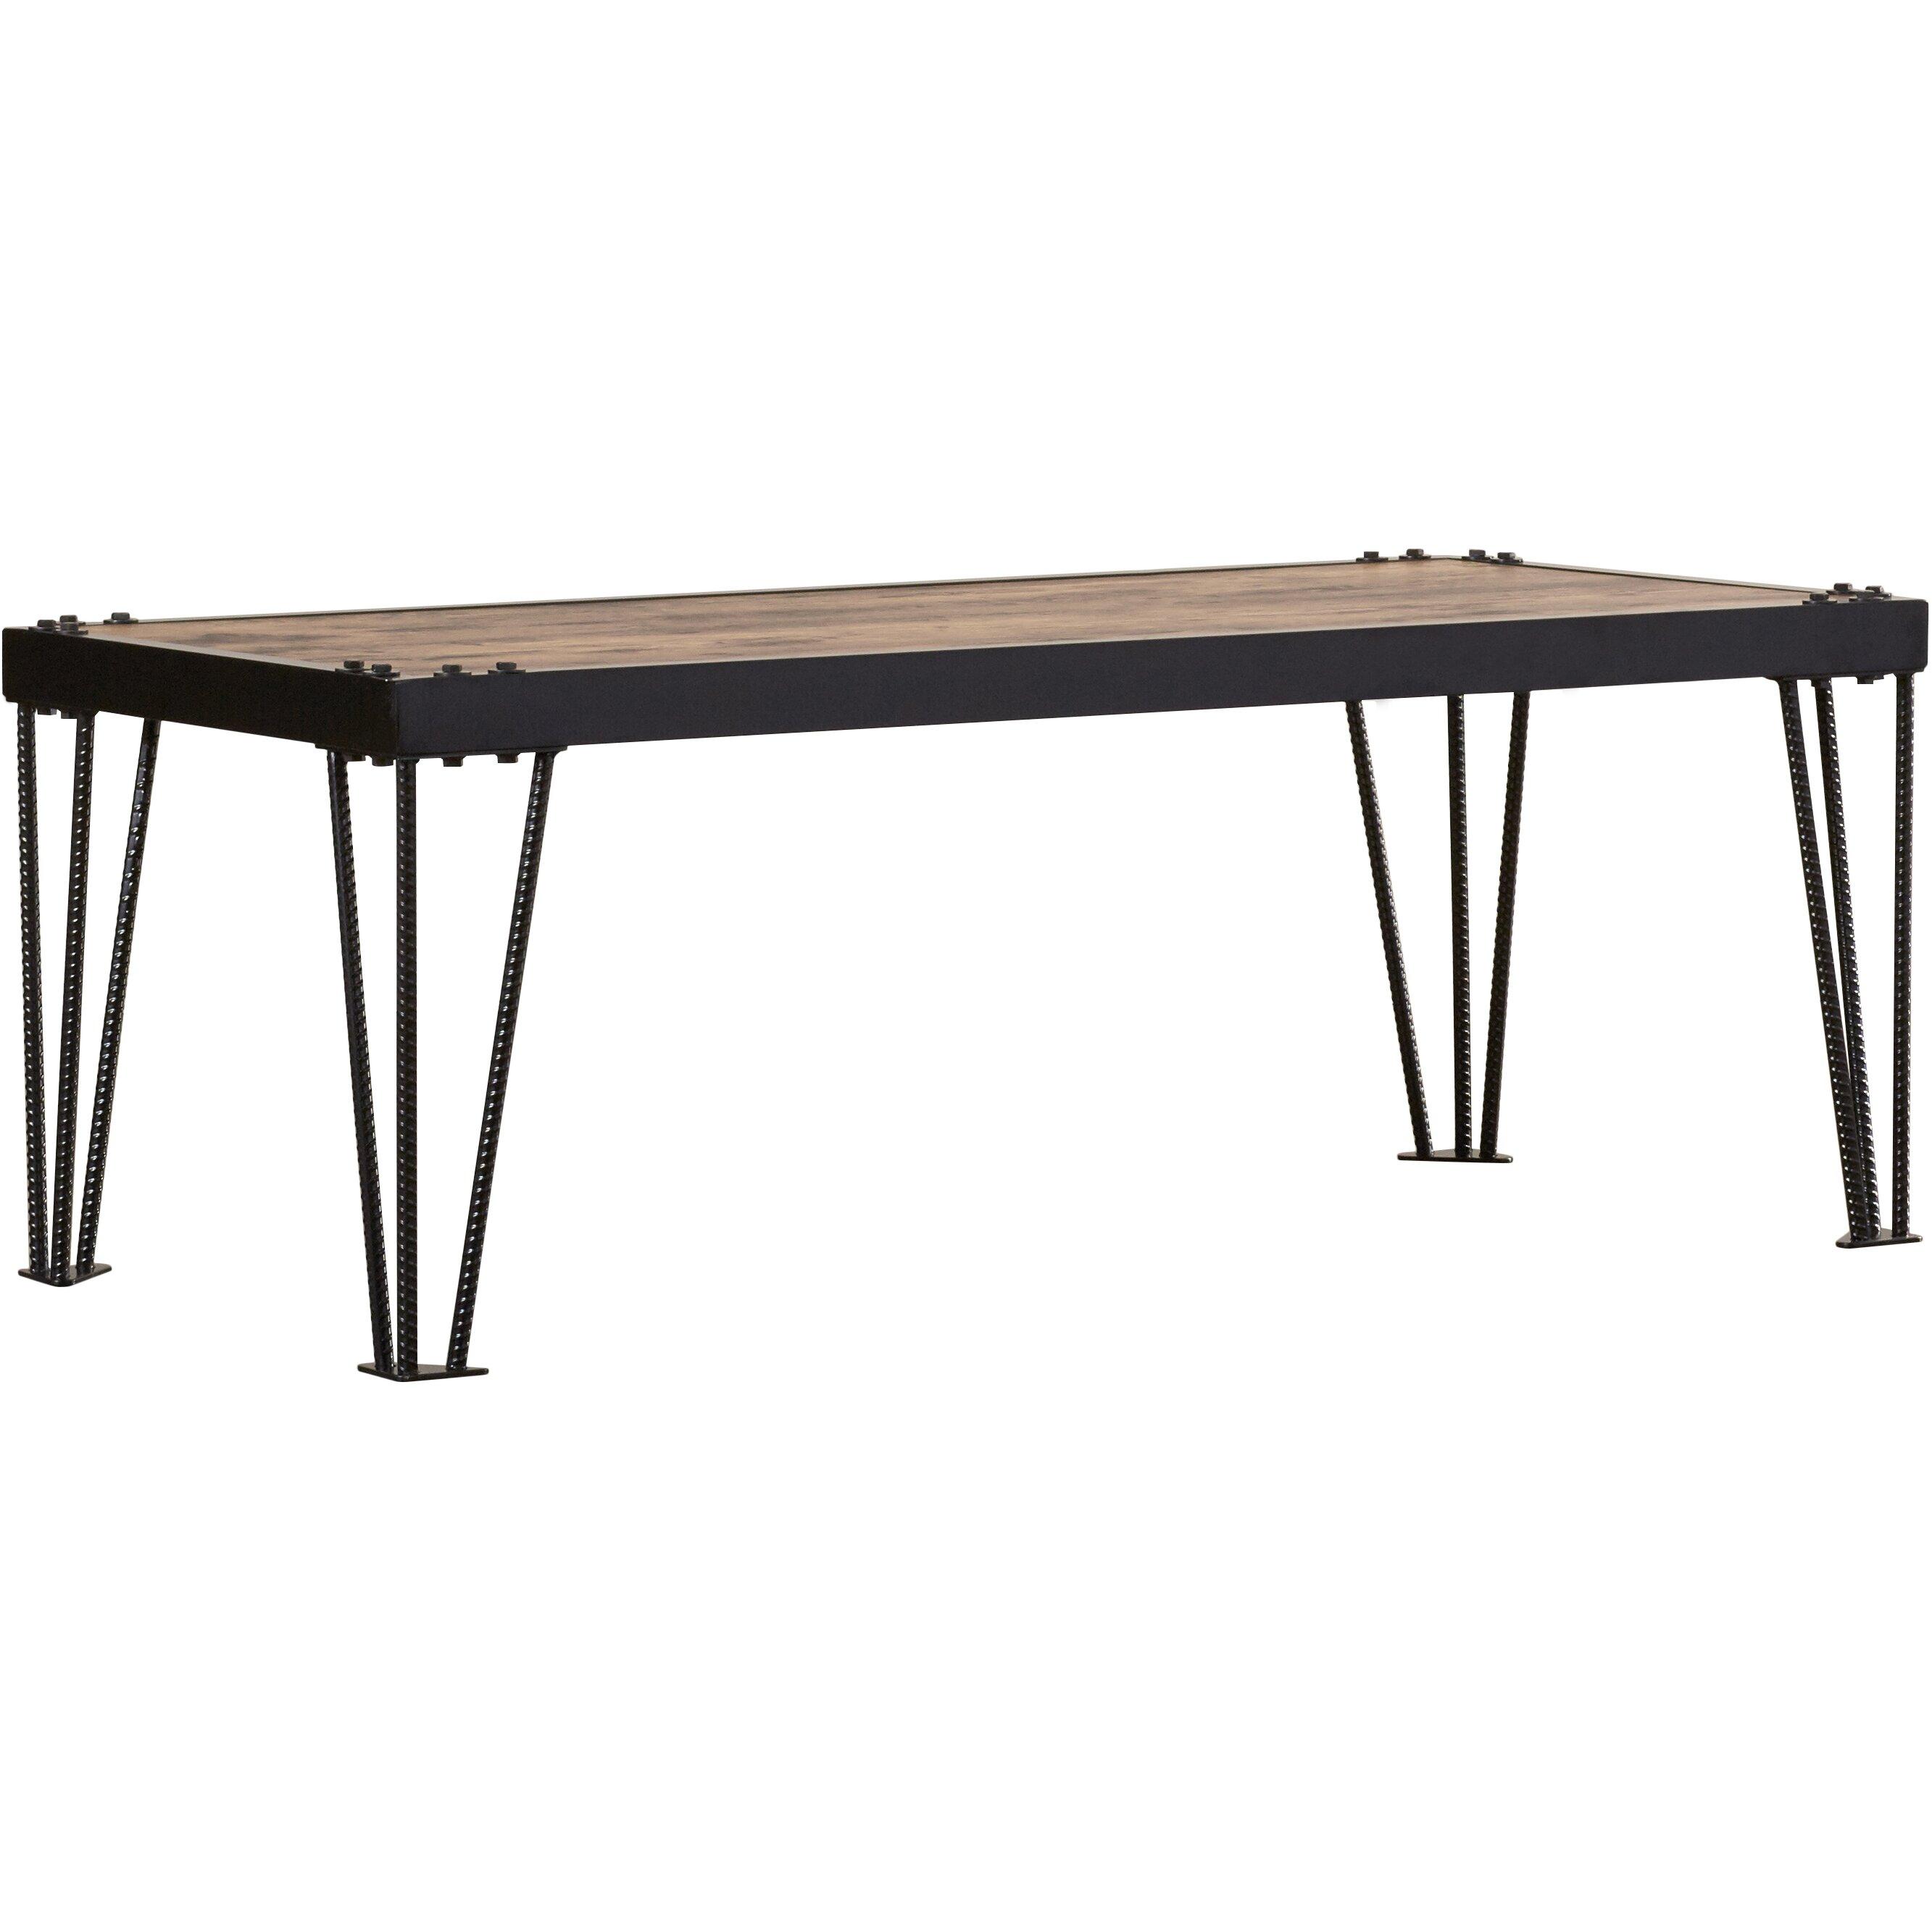 Trent Austin Design Laguna Coffee Table Reviews: Trent Austin Design Horne Coffee Table